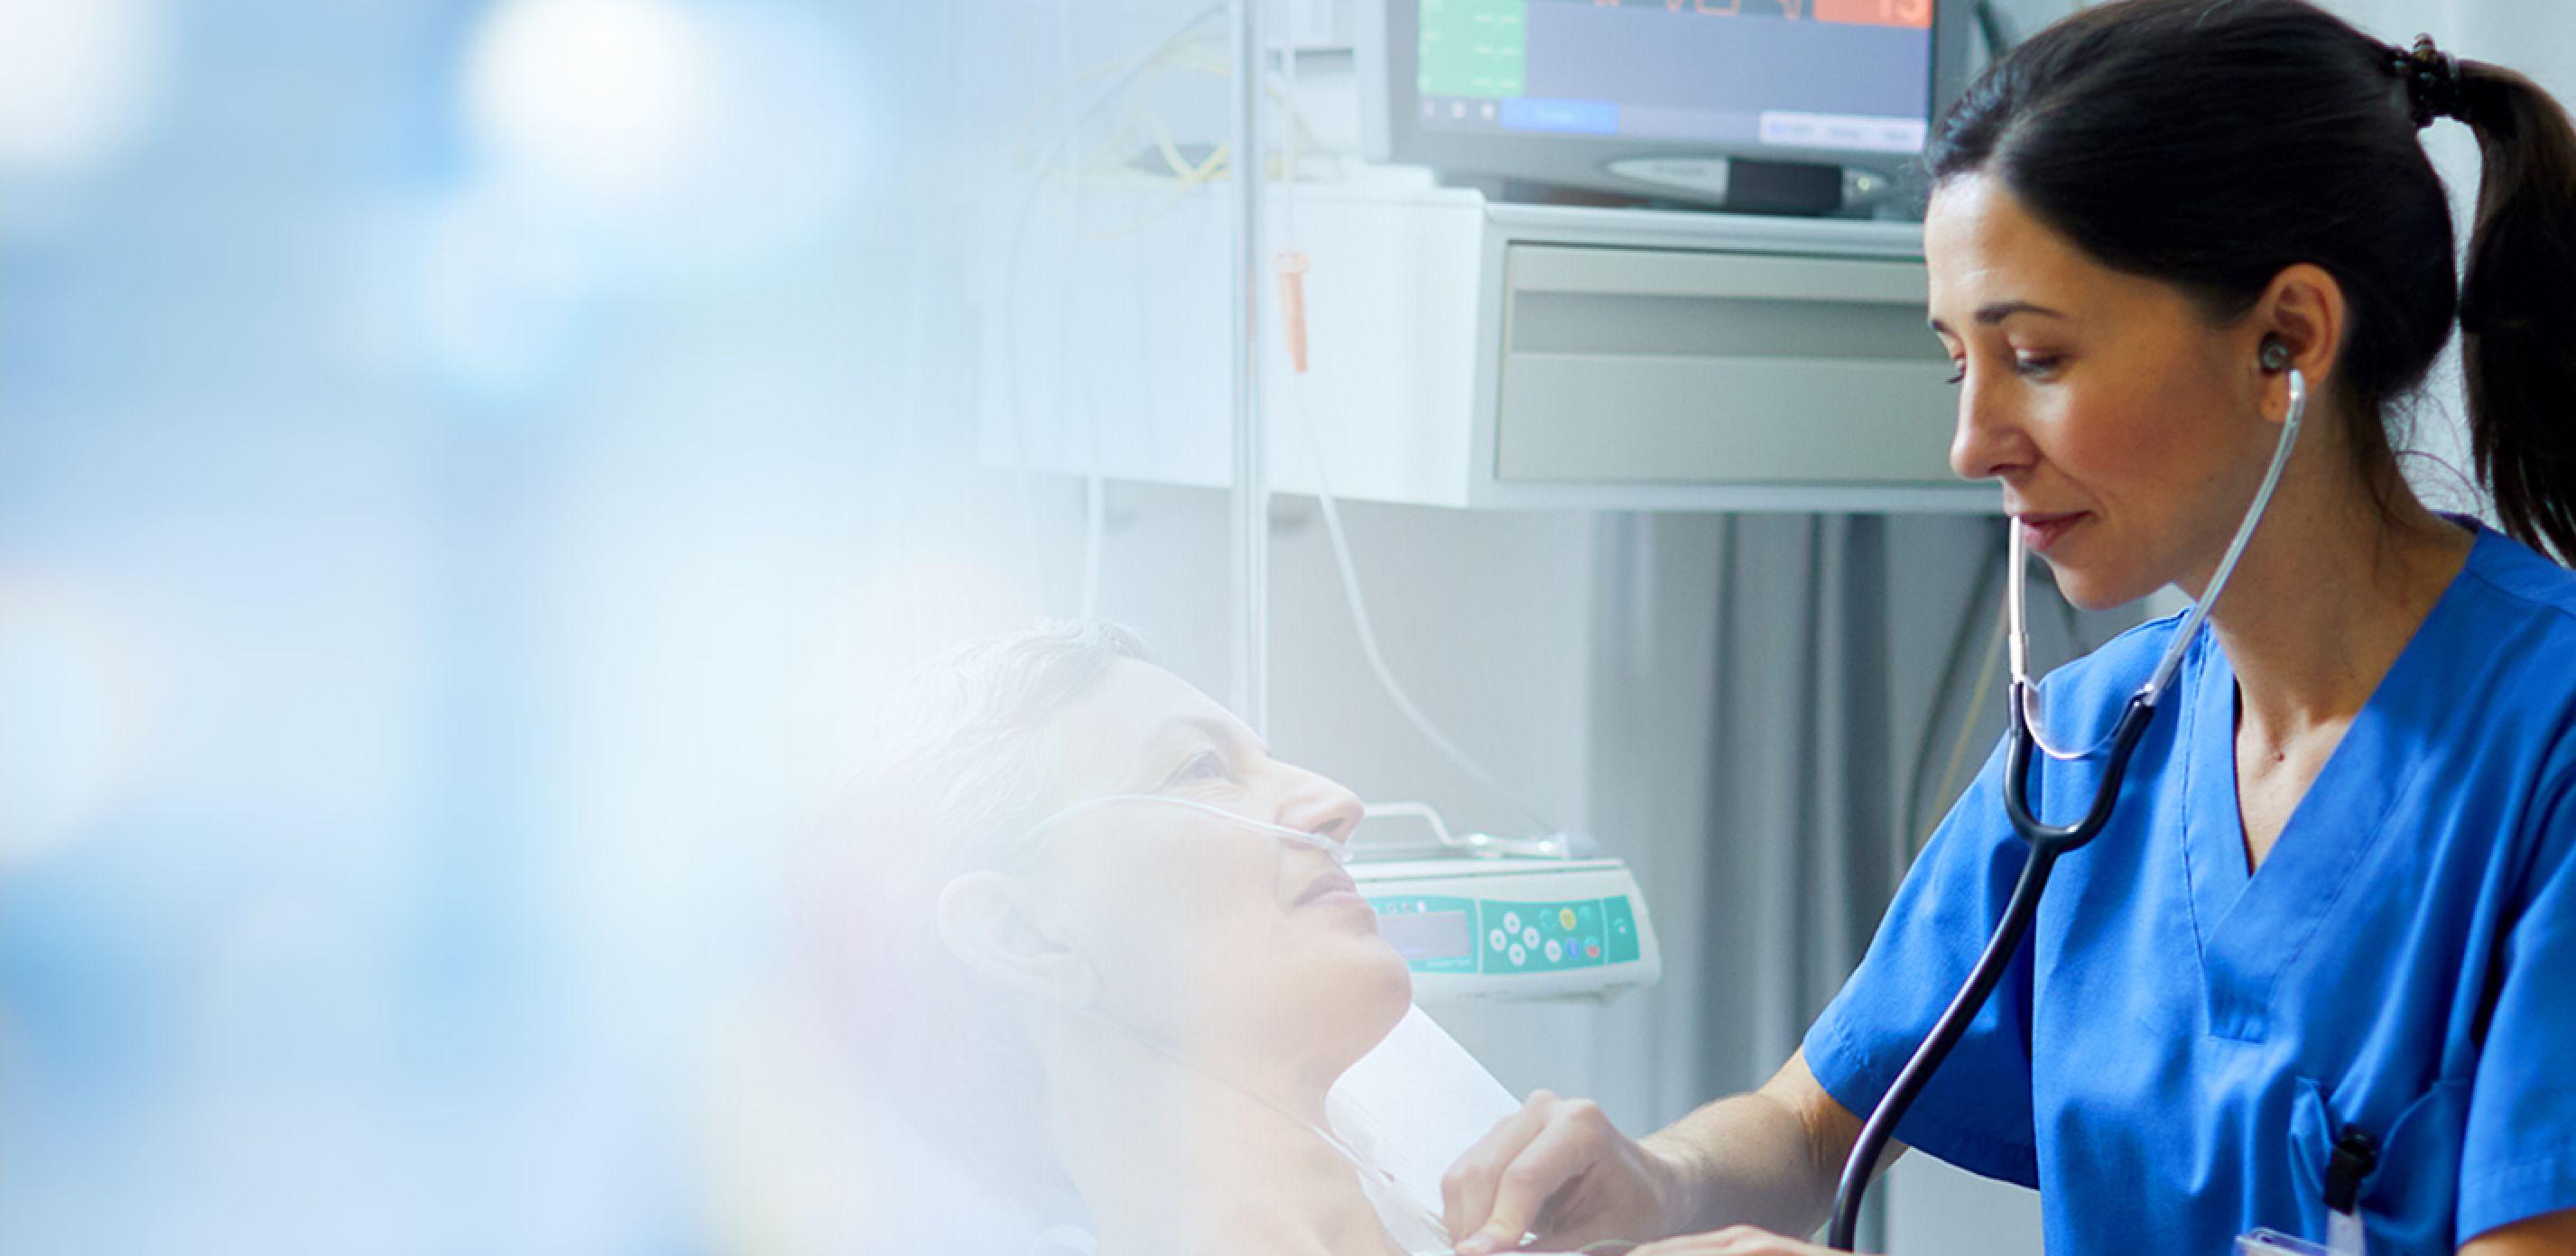 Enhancing emergency care